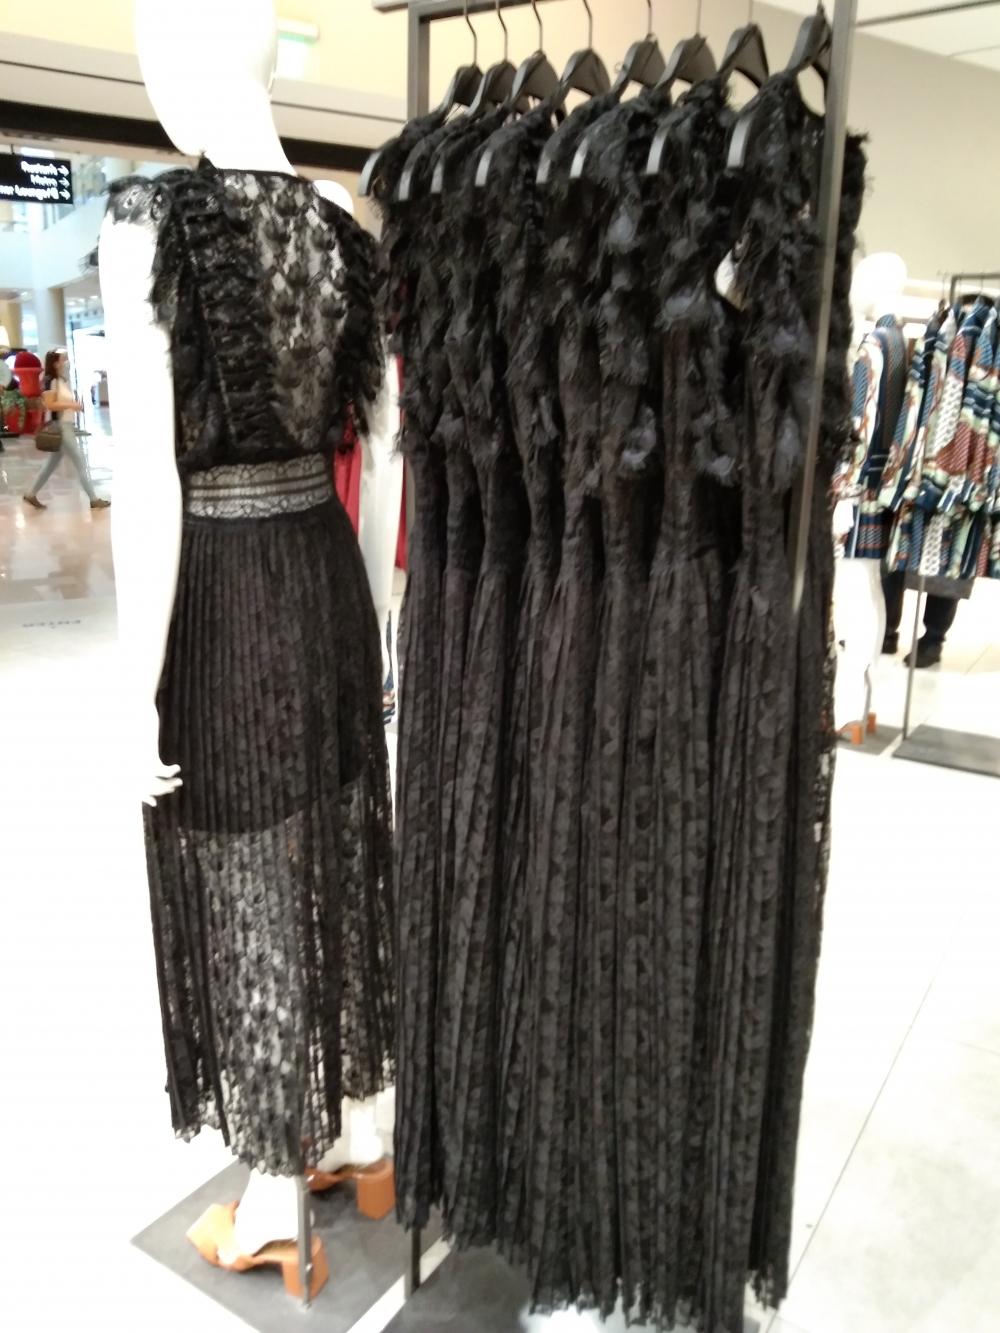 Black dress, Clothing